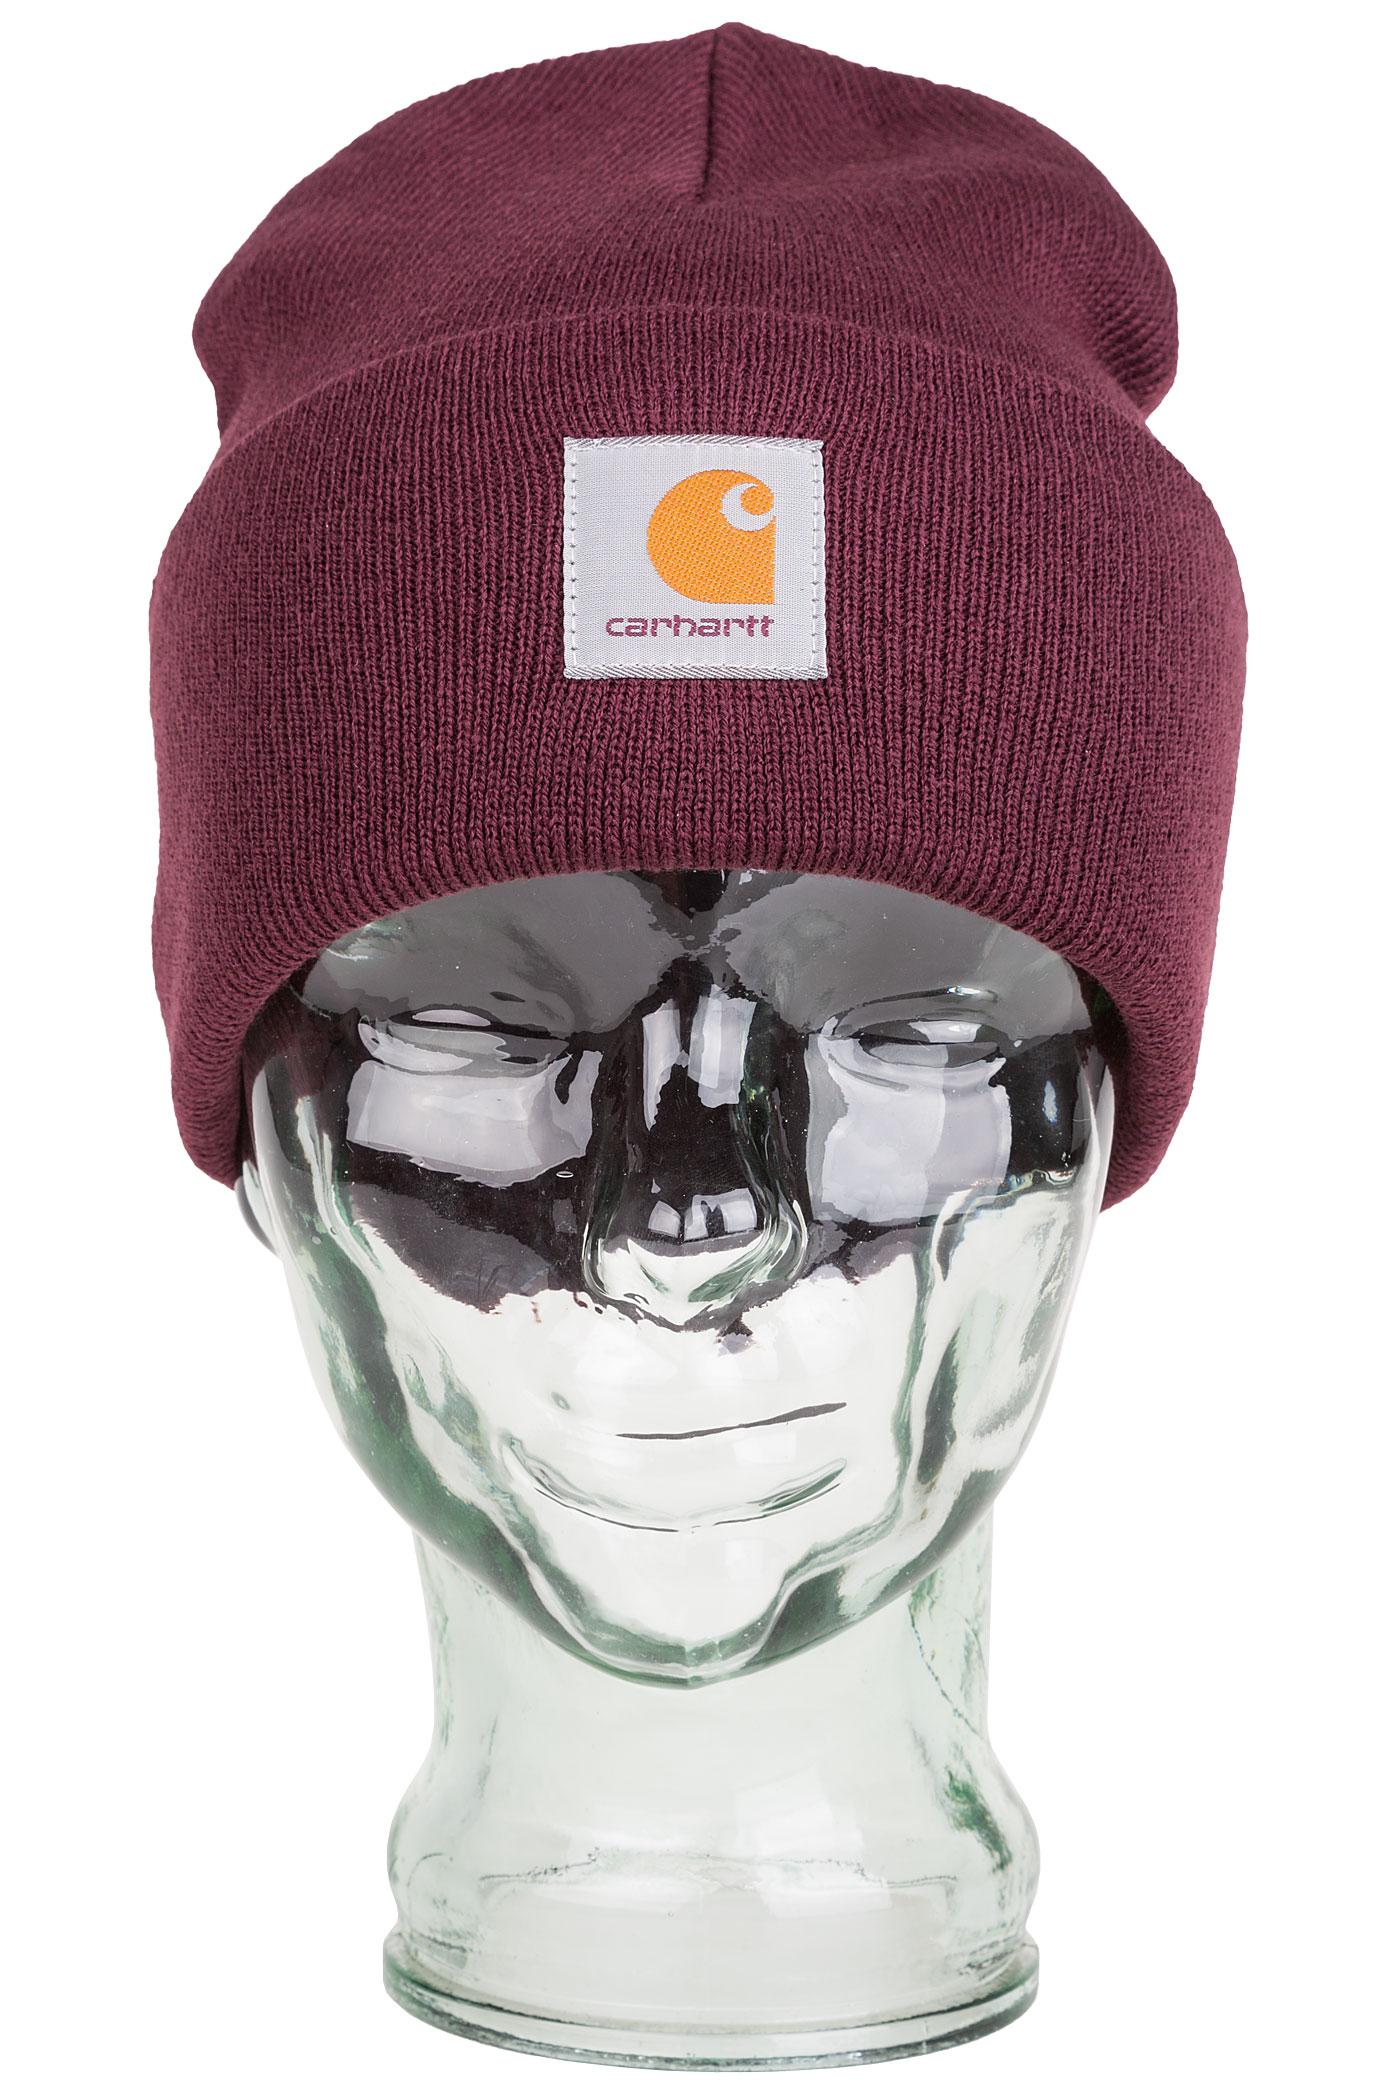 Carhartt WIP Acrylic Watch Bonnet (chianti)